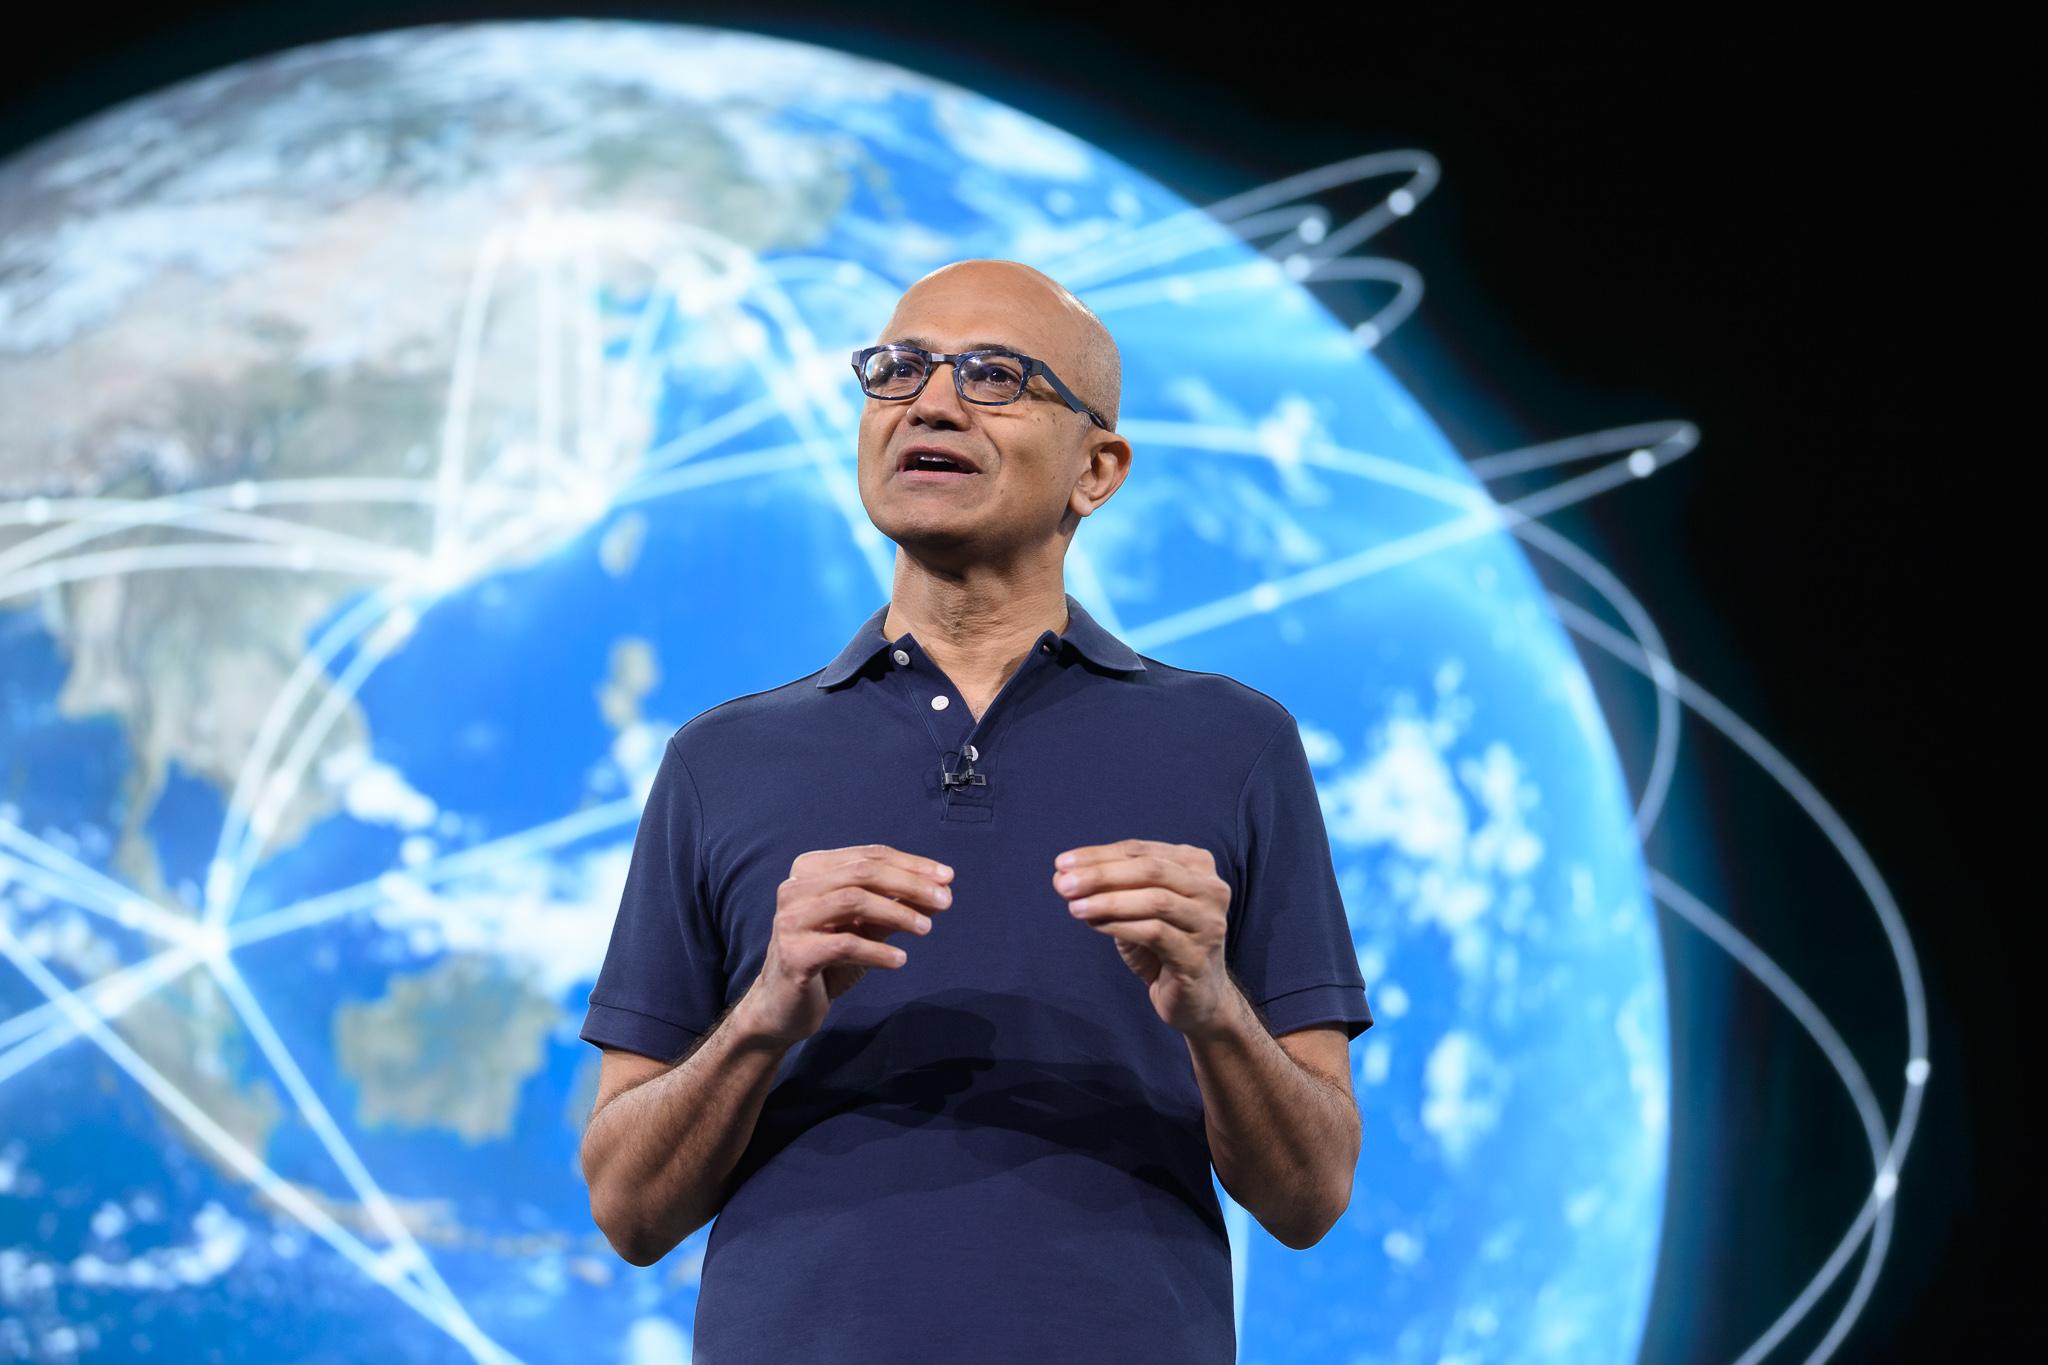 Microsoft to spend $1.1B in Mexico on digital access programs未来五年,微软将在墨西哥投资11亿美元数字技术项目